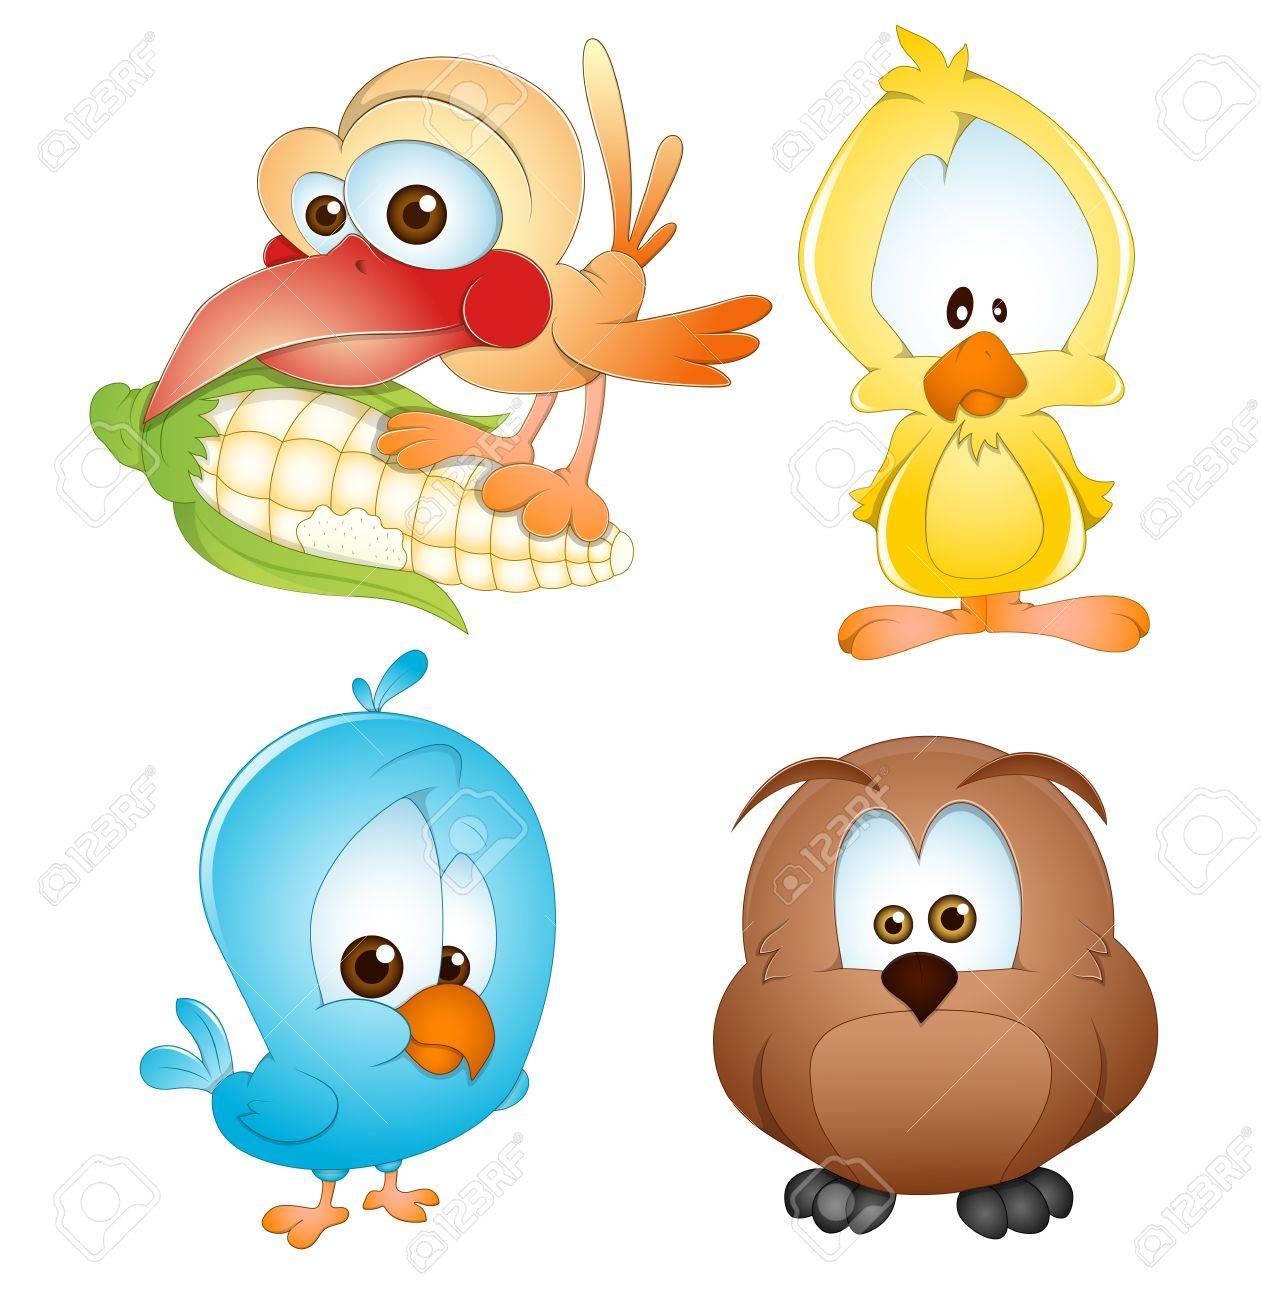 Cute Birds Vectors Stock Vector - 15244687